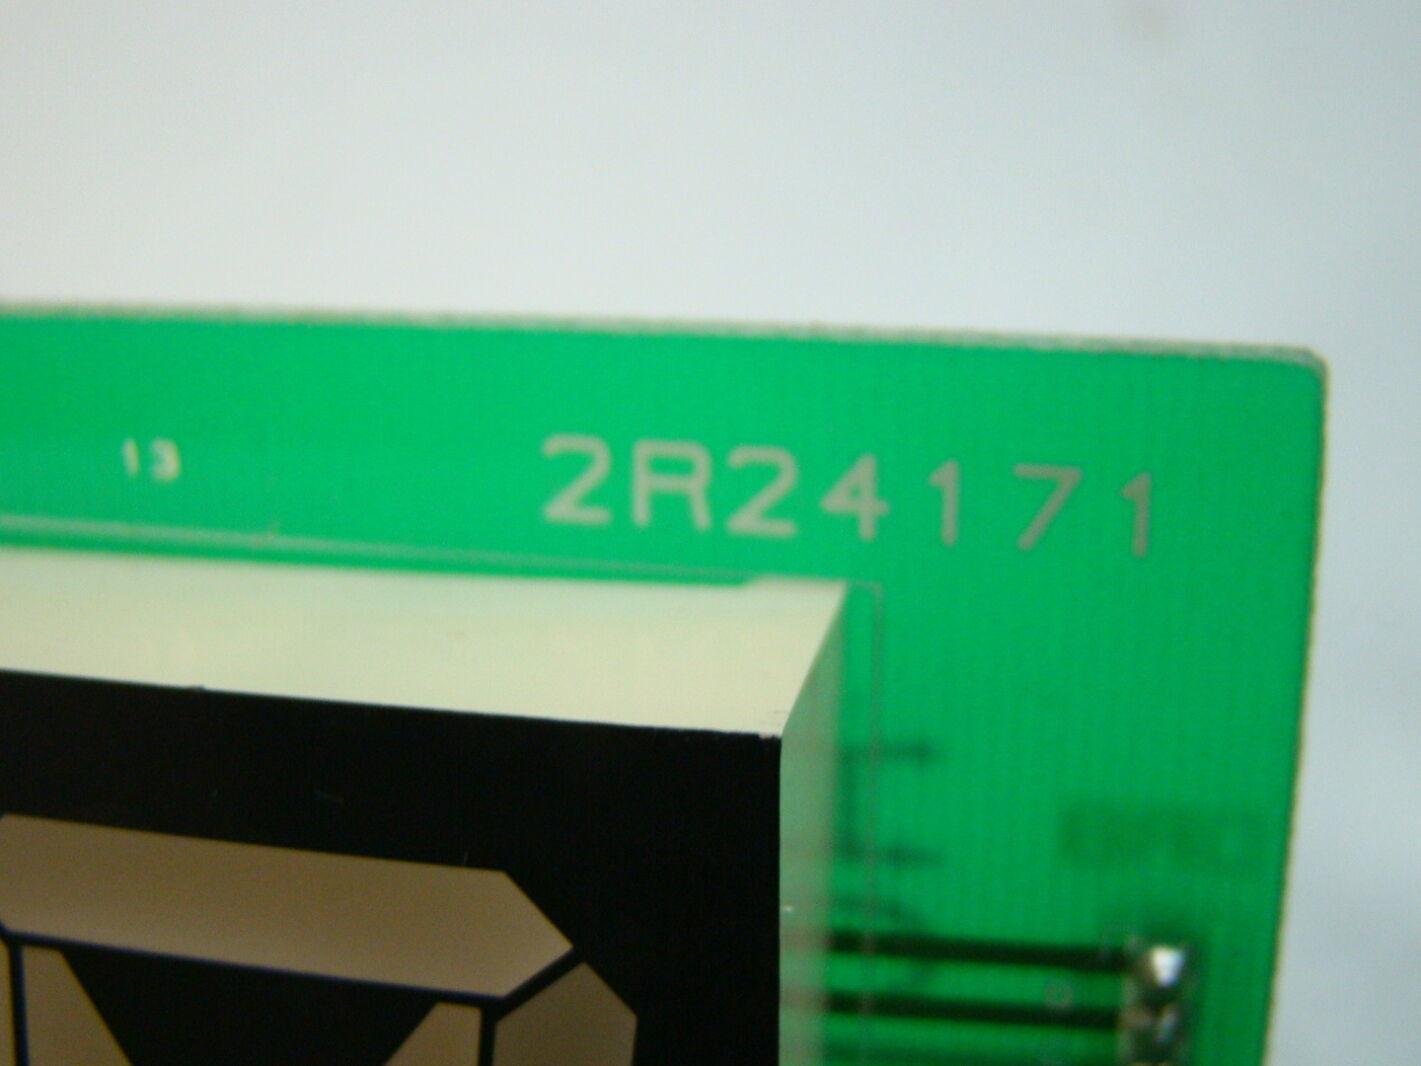 Details about LG Otis Elevator PC Board FLDS 2R24171 #06B766